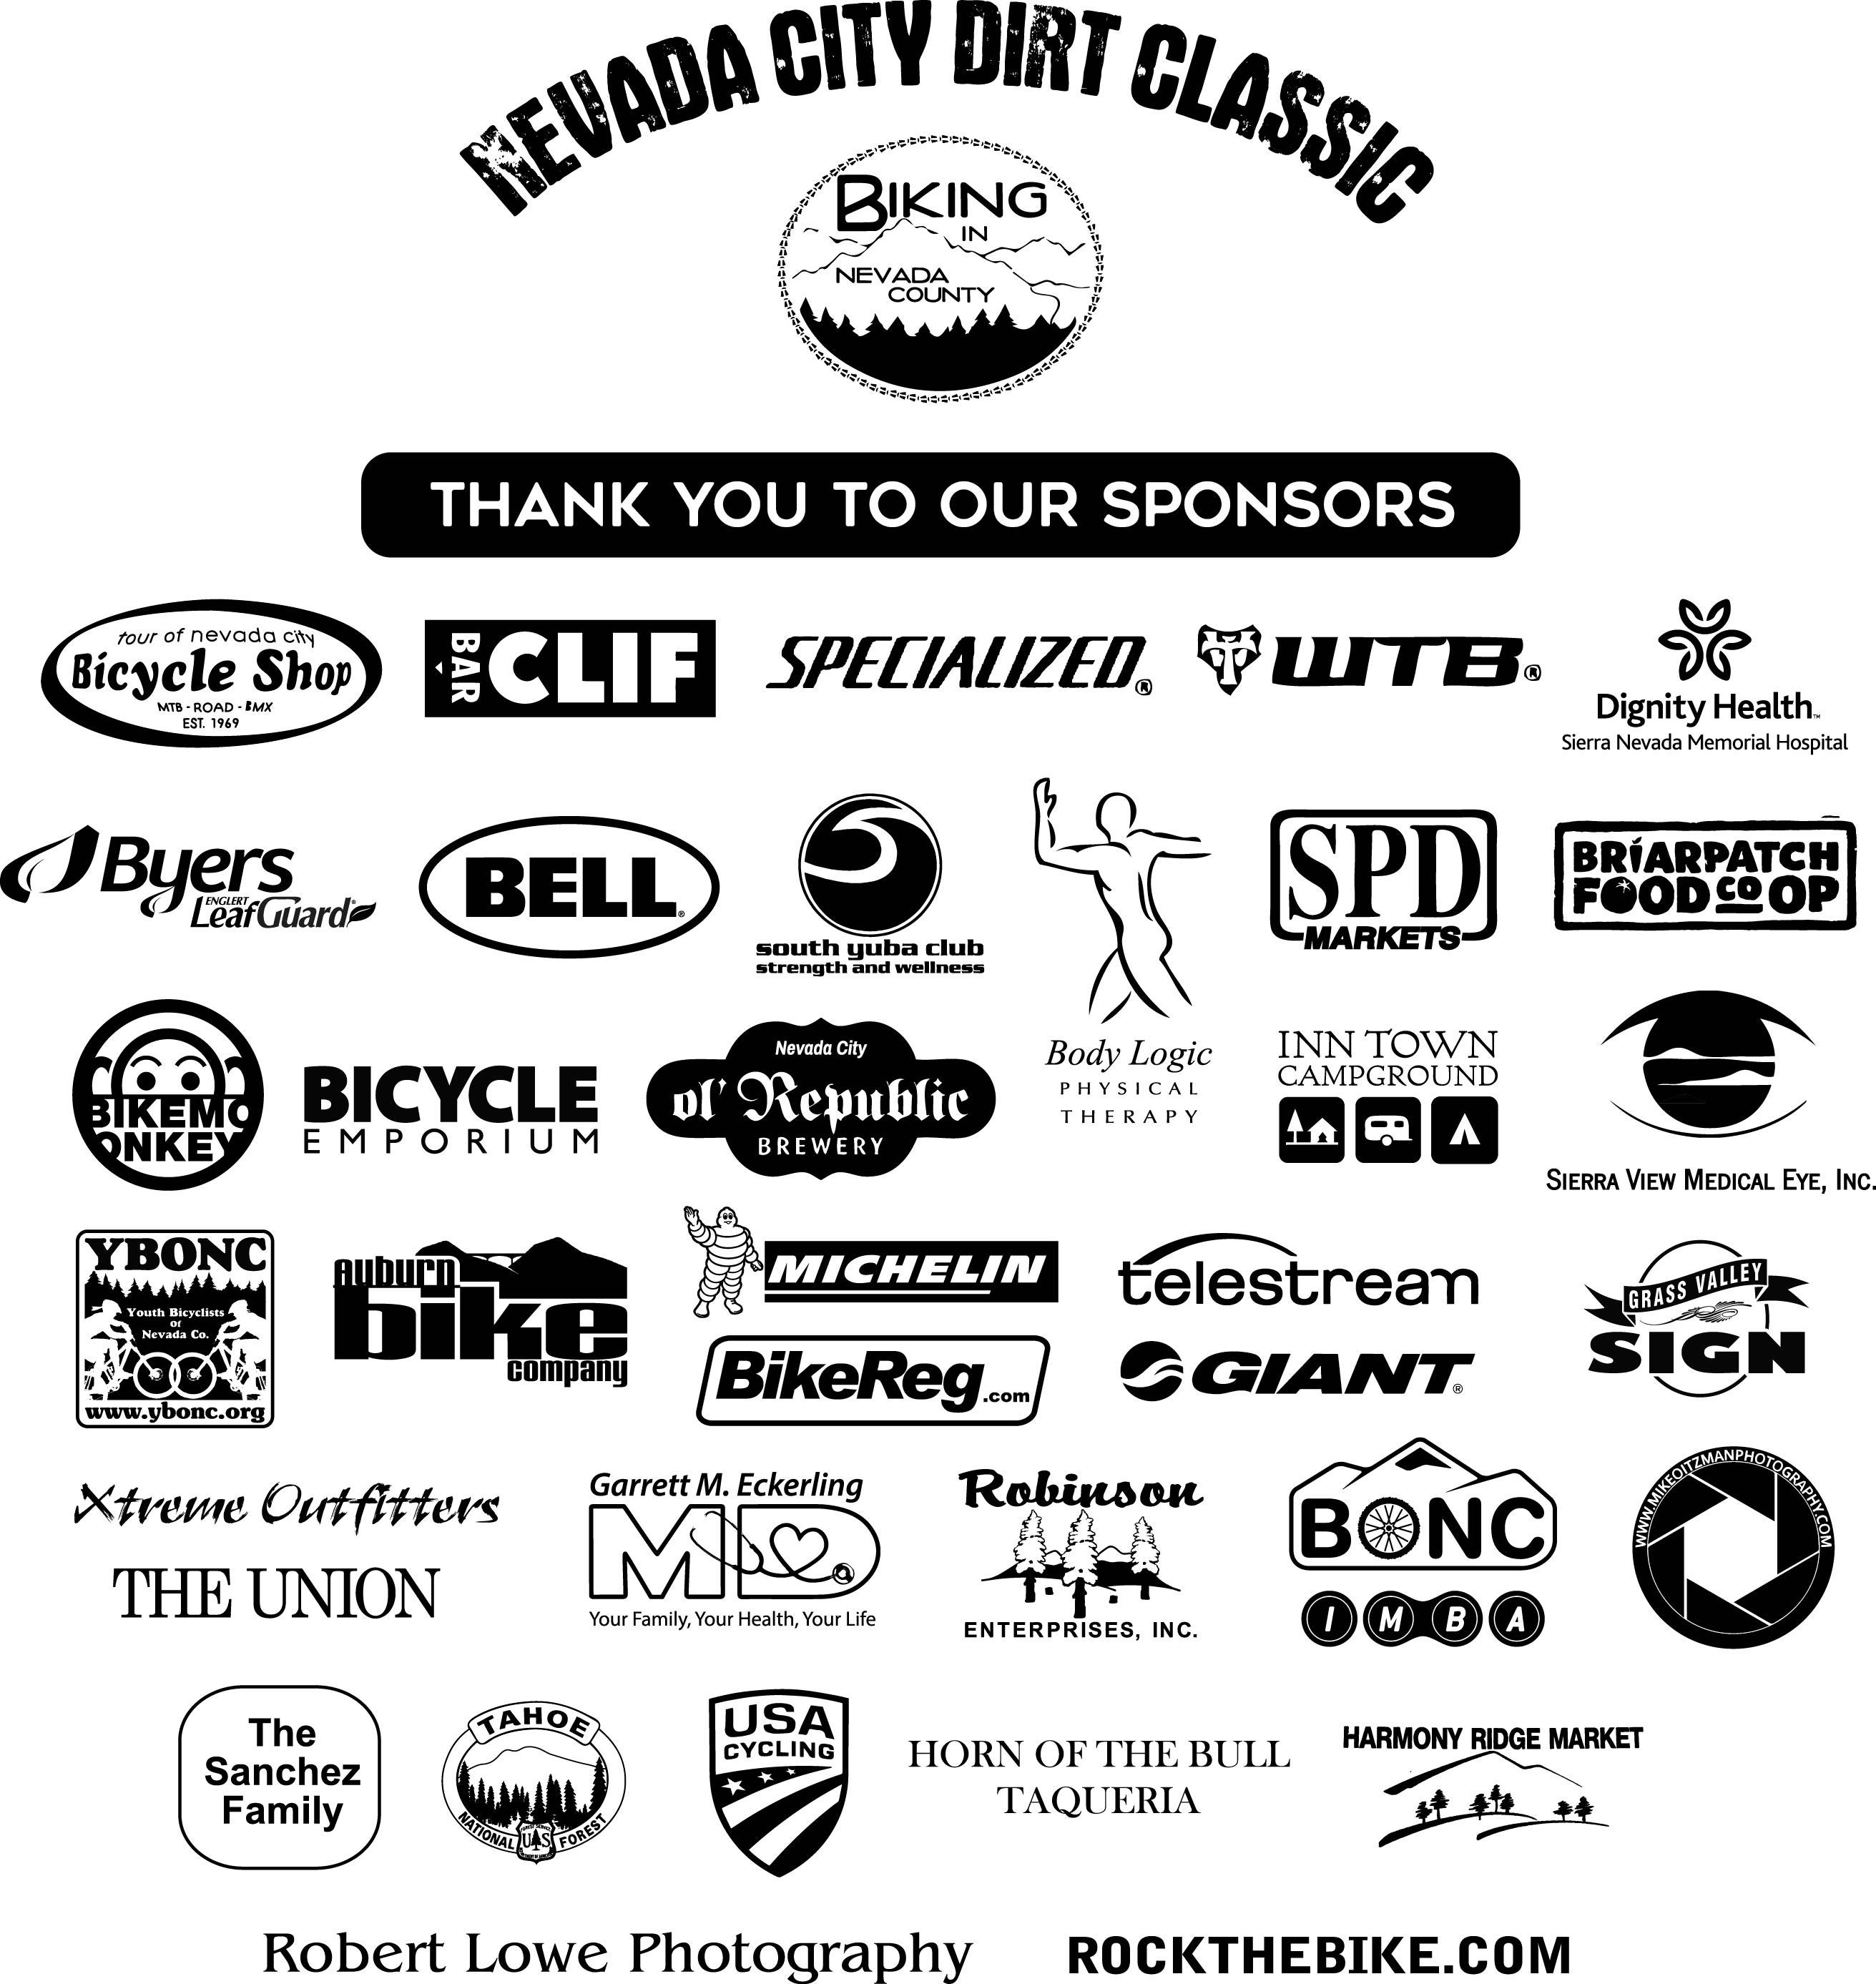 2017 Dirt Classic Sponsors